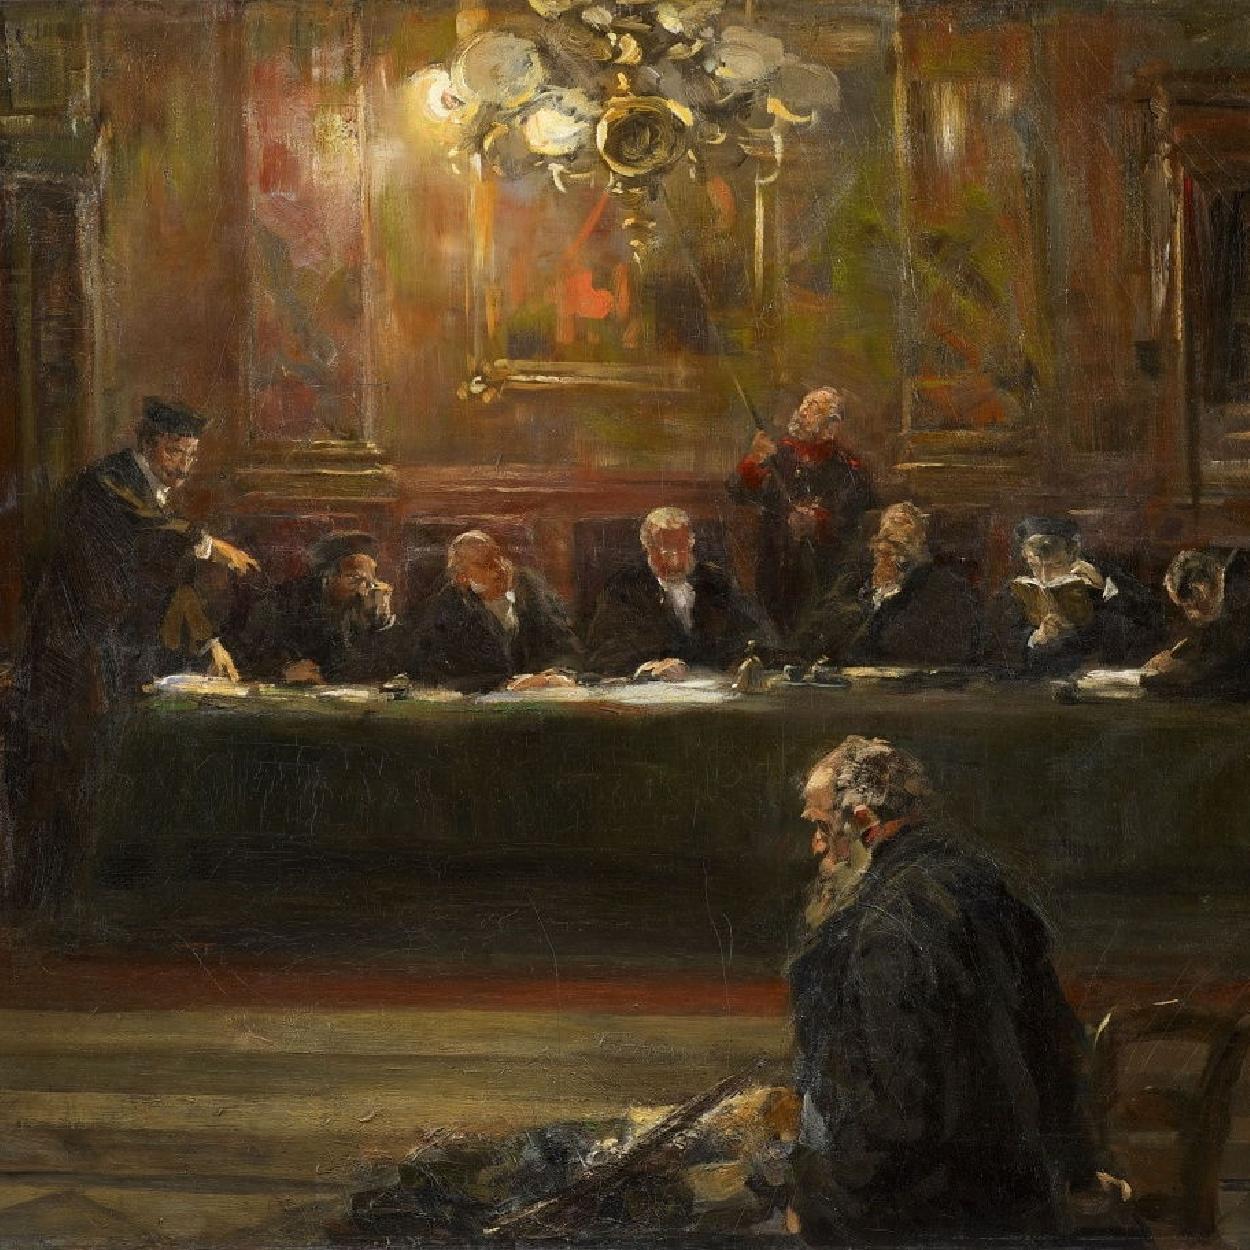 Protecting Freedom of Association: Americans for Prosperity v. Bonta